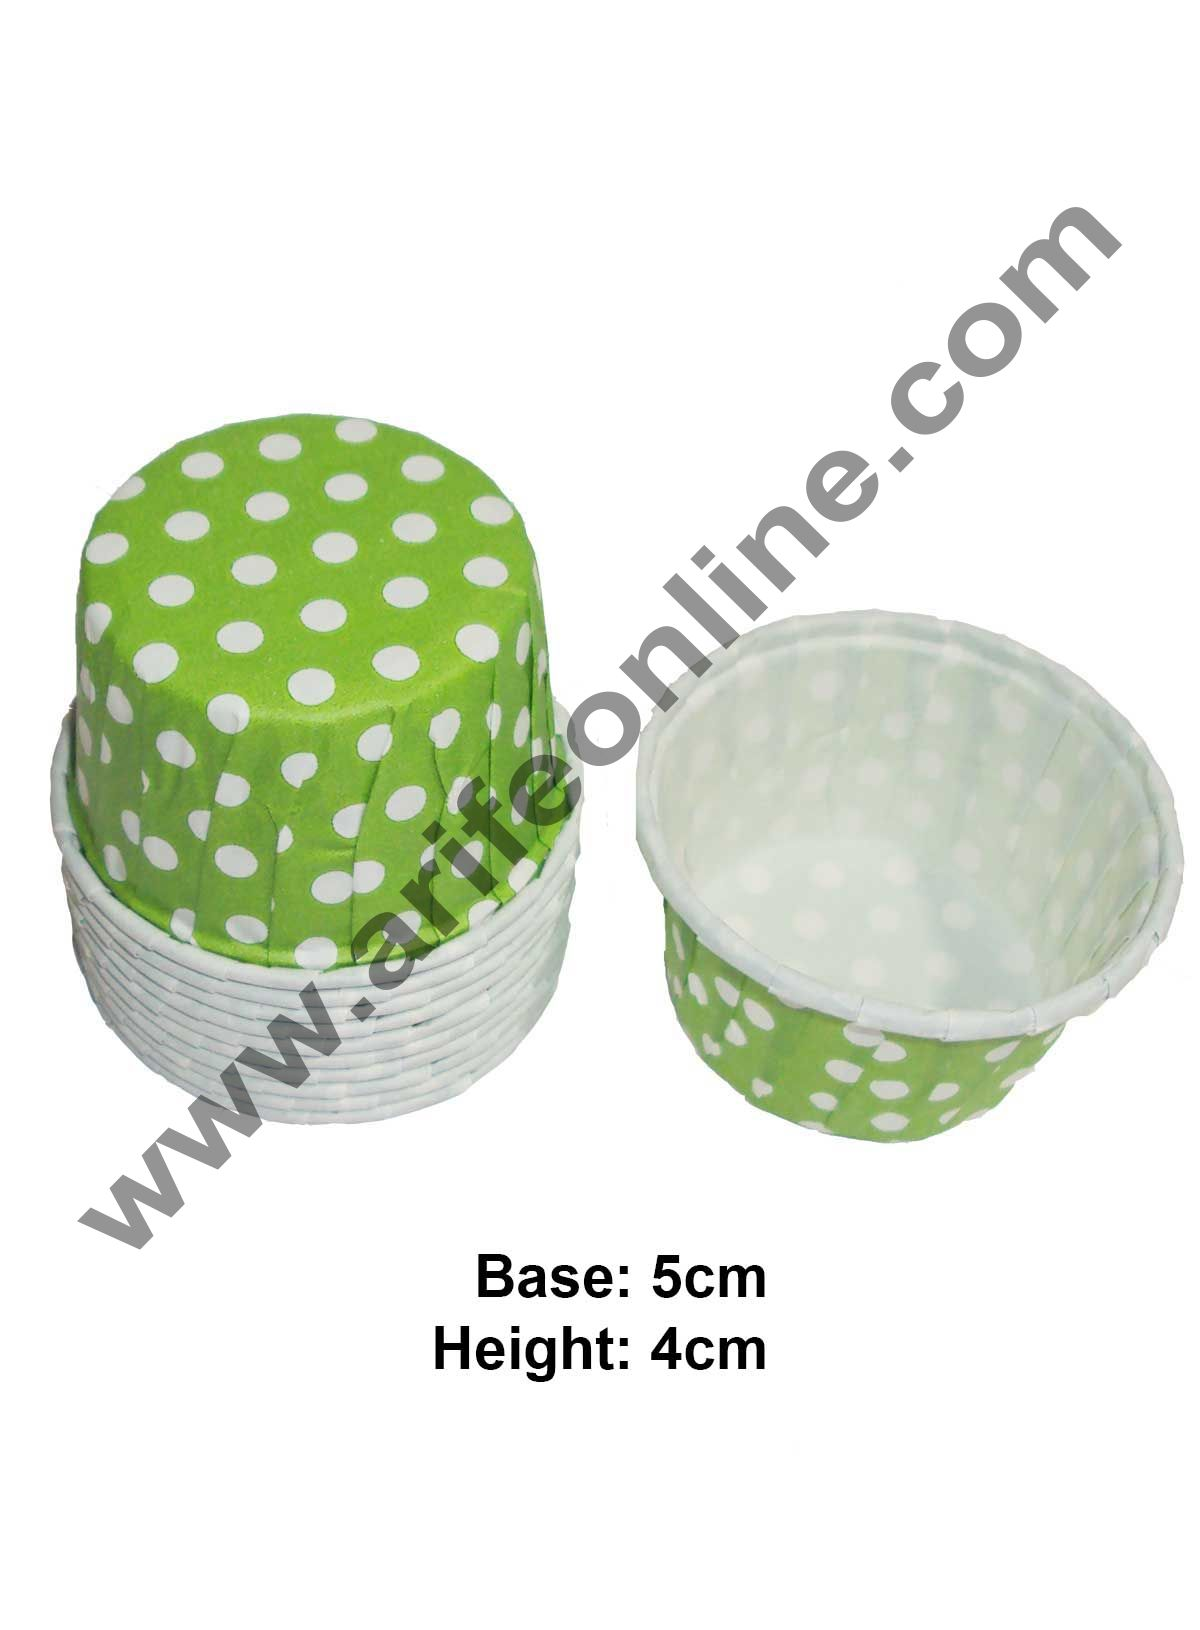 Novacart Bake & Serve Paper Baking Mould By Cake Decor - Green Cupcake Mould 10 Pcs